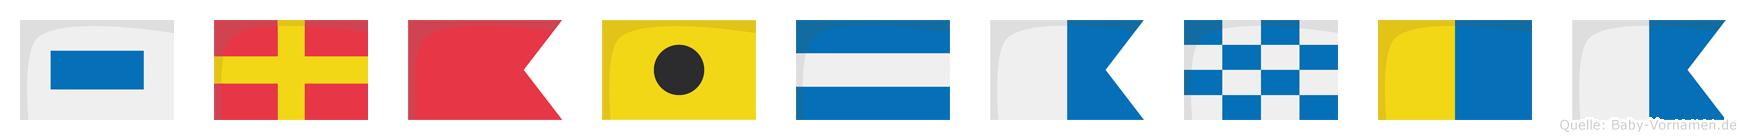 Srbijanka im Flaggenalphabet